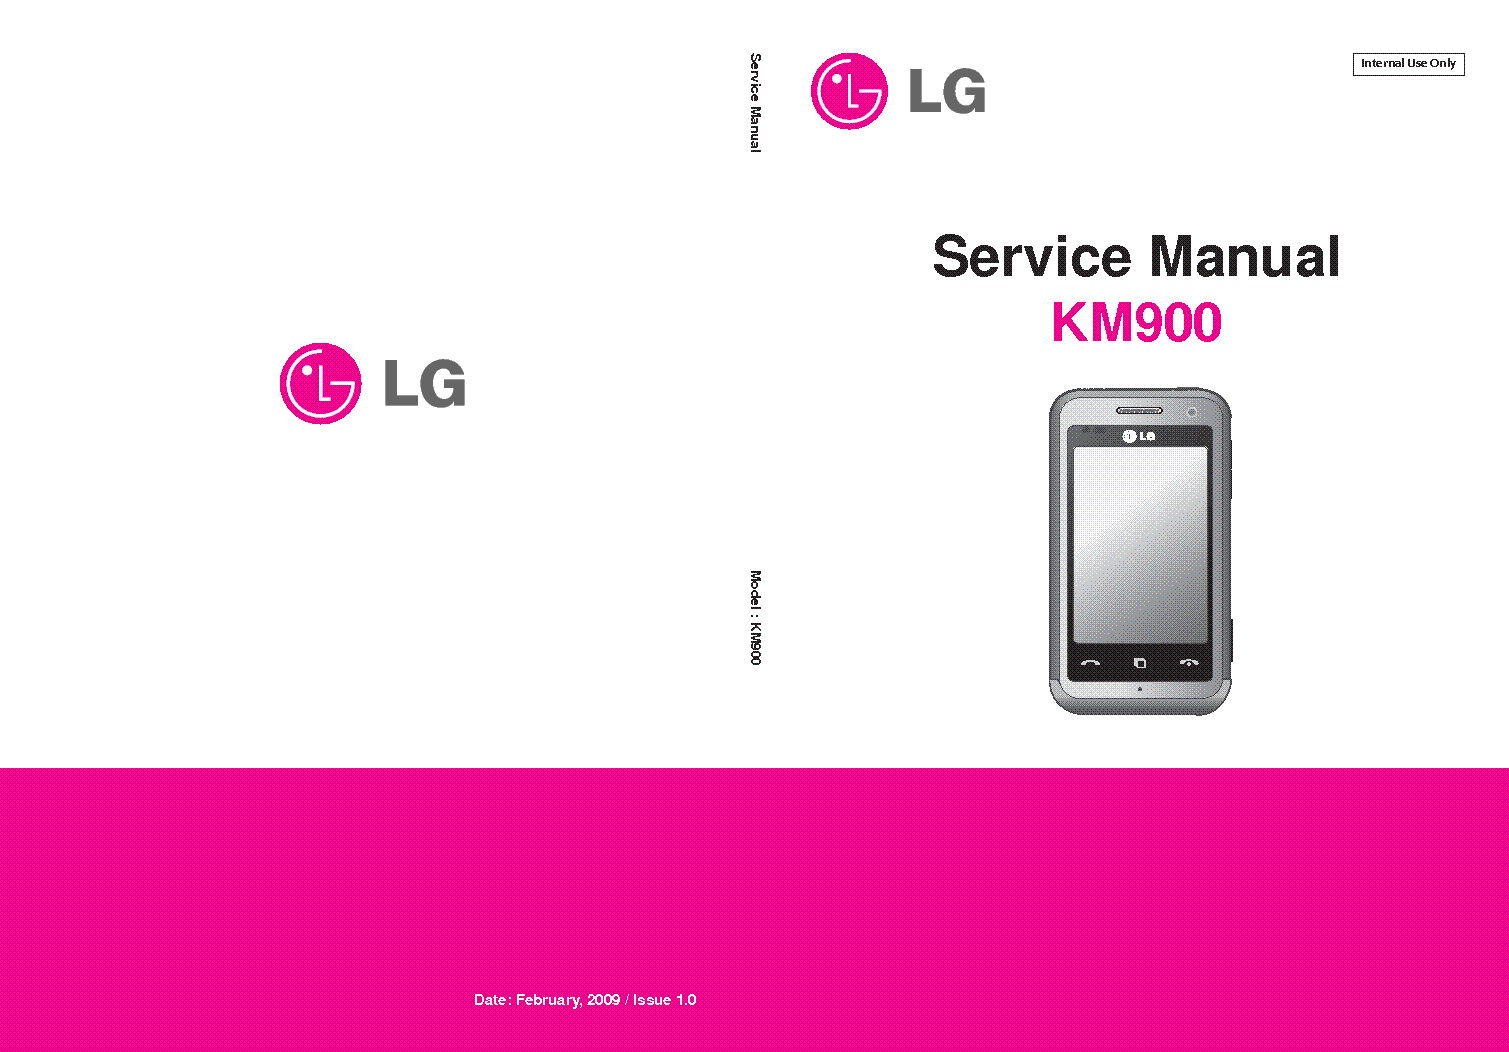 Bcd996xt Manual Epub Download